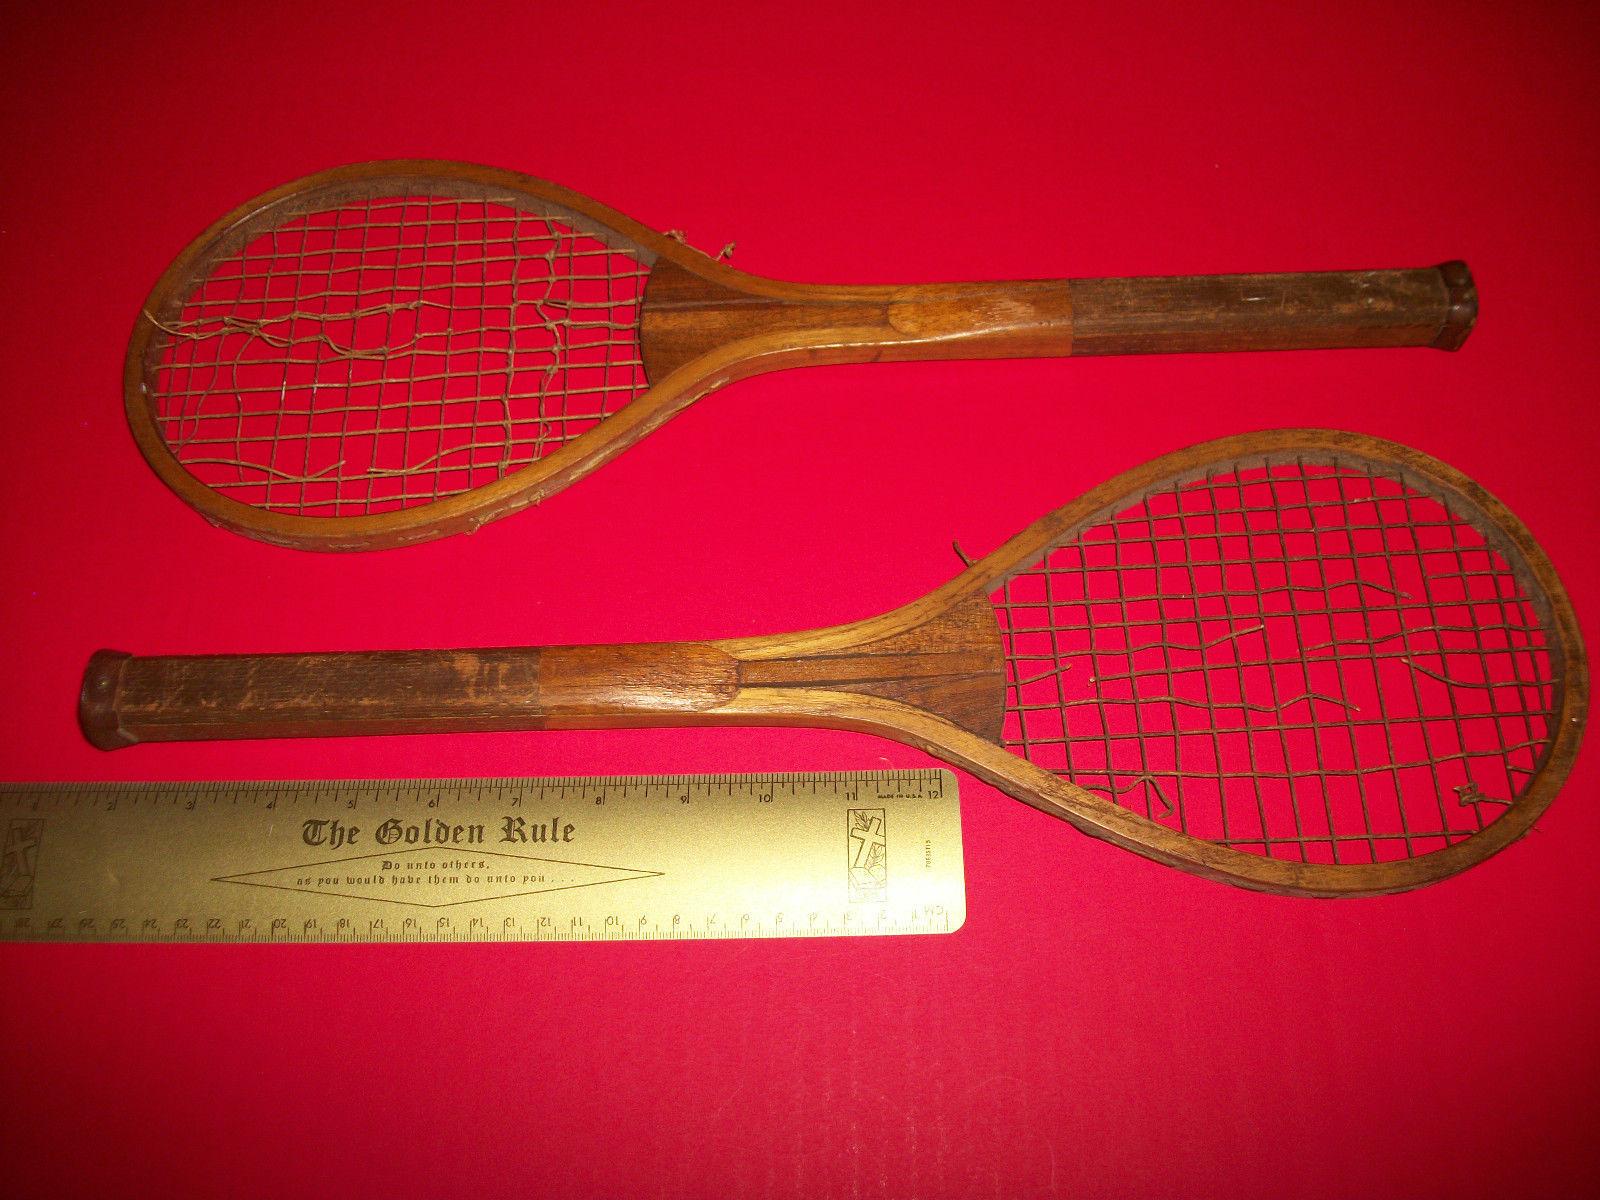 Sport Treasure Tennis Racquet Racket Sporting Good Pair Old Wood Equipment Decor image 10